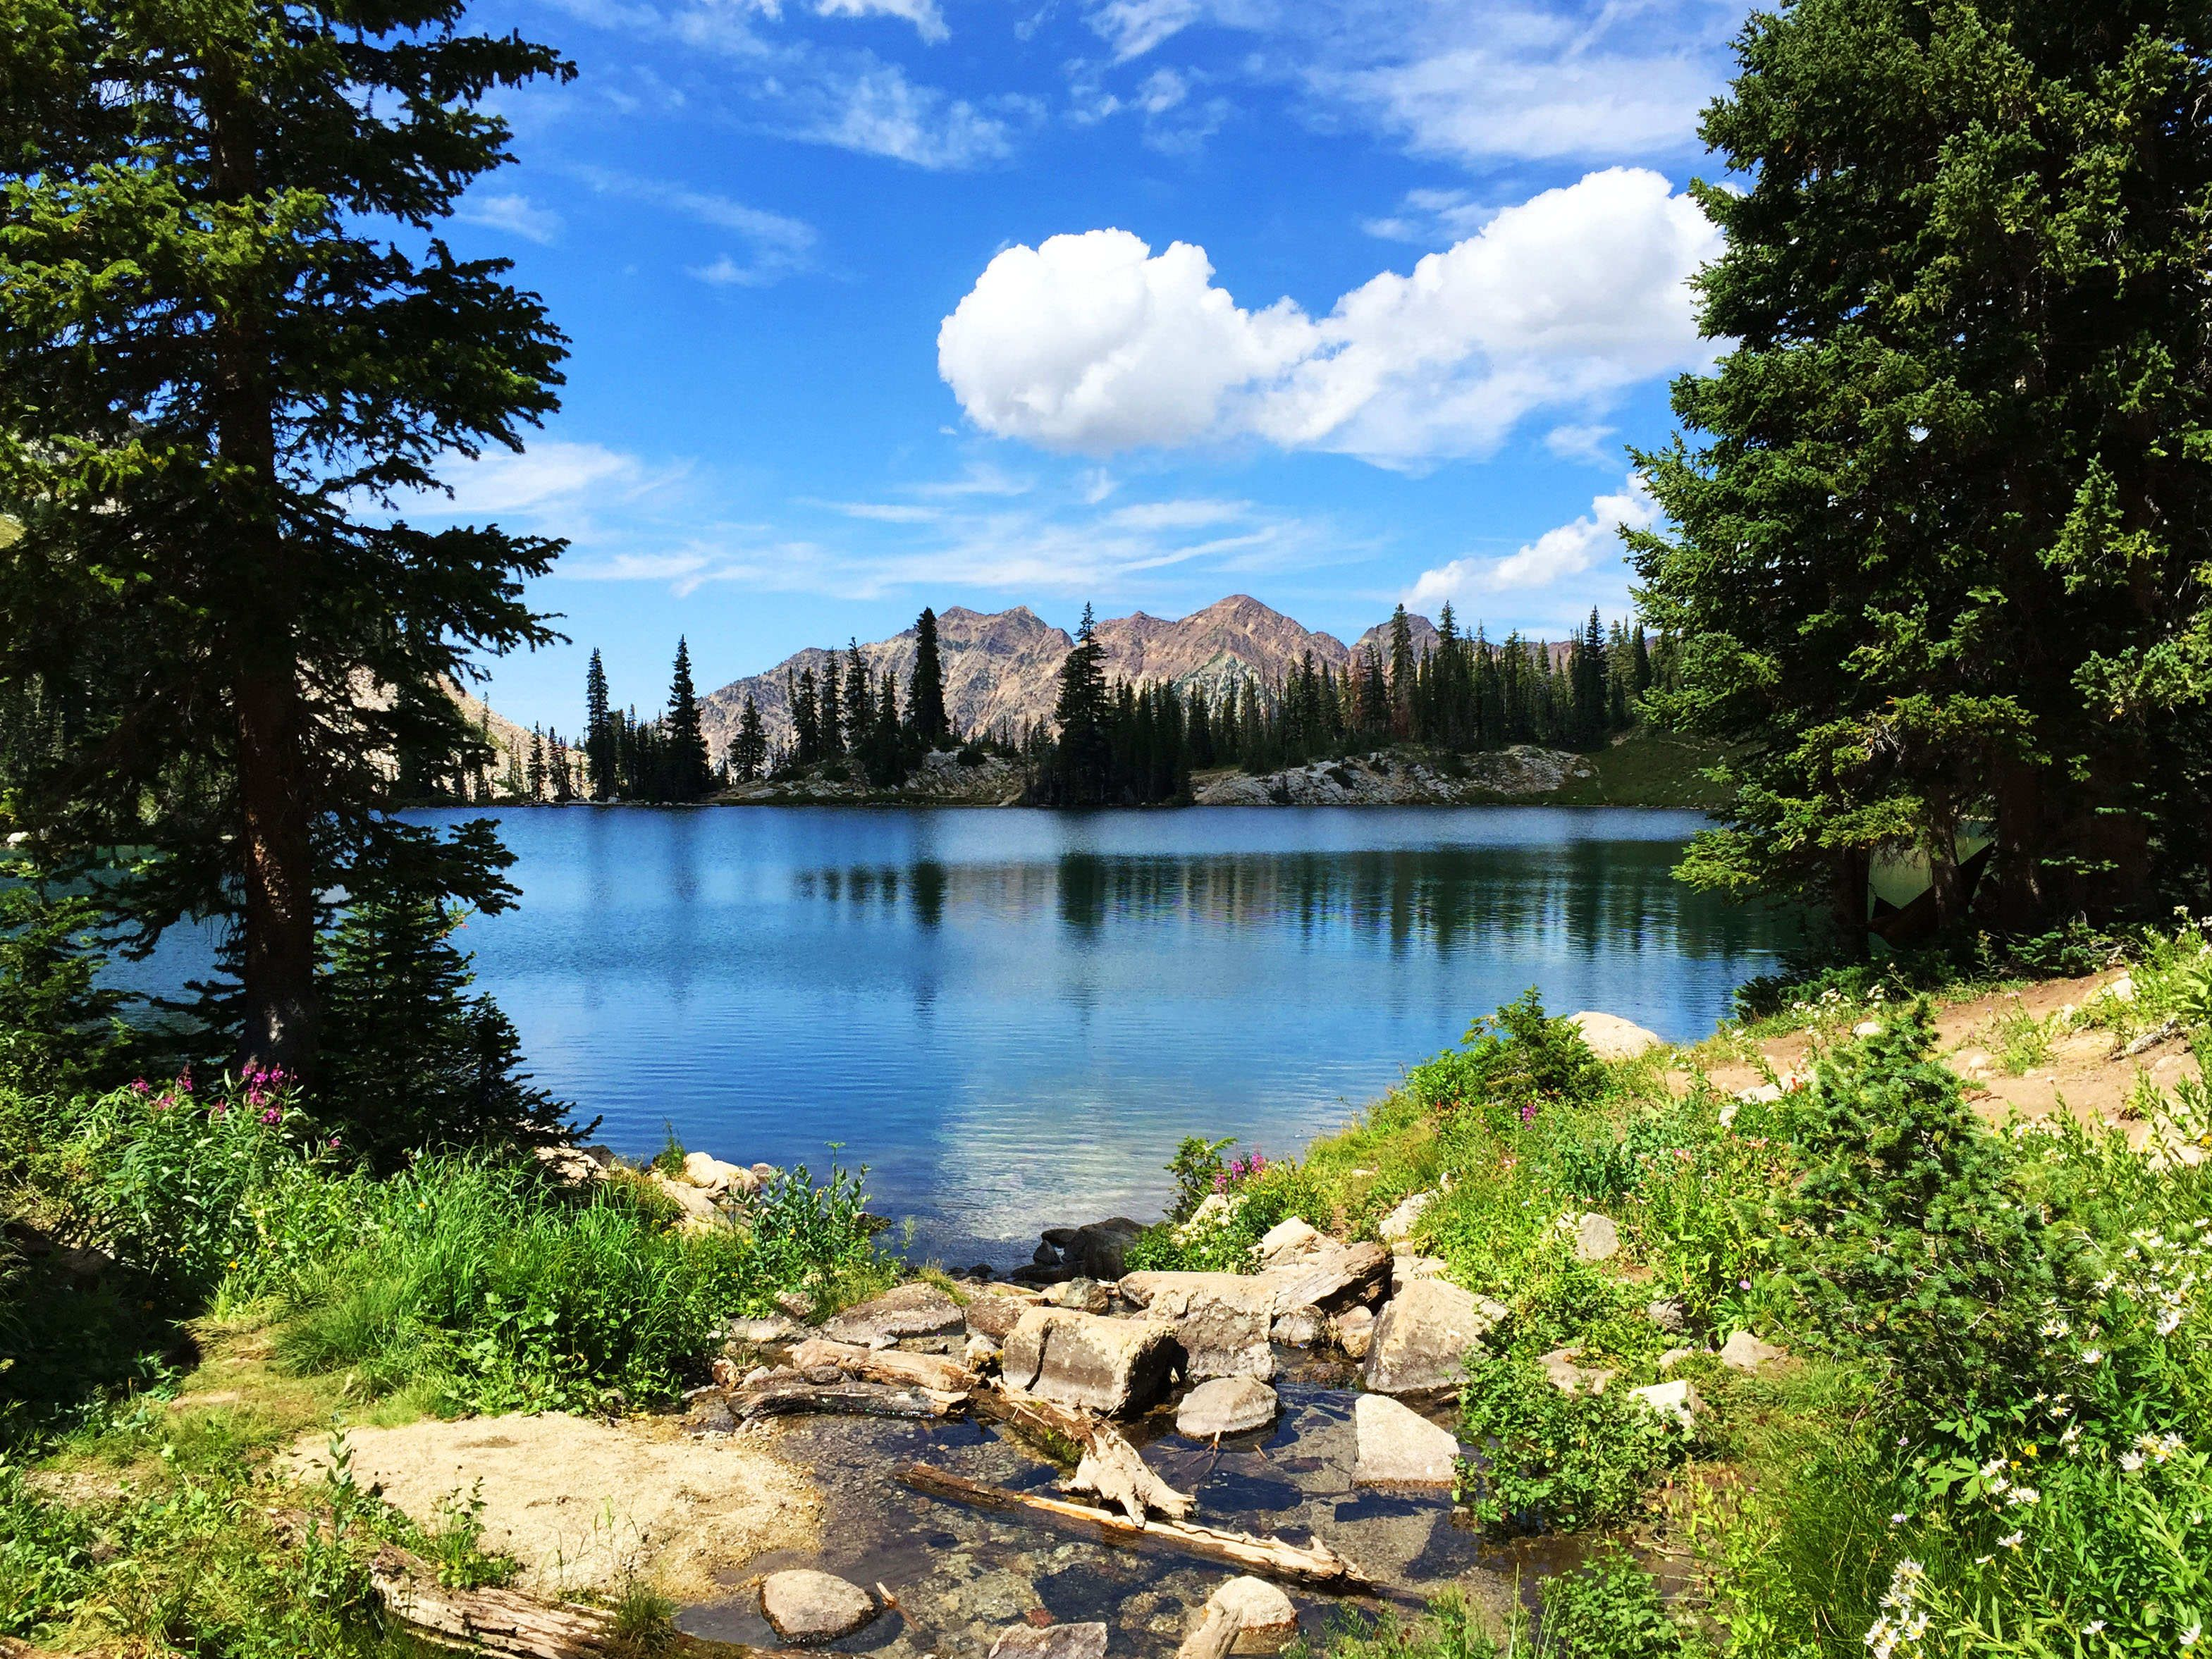 Red Pine Lake Is One Of Utah S Prettiest High Alpine Lakes Near Salt Lake City Its Turquoise Water Rests At The F Utah Travel Utah Camping Salt Lake City Utah